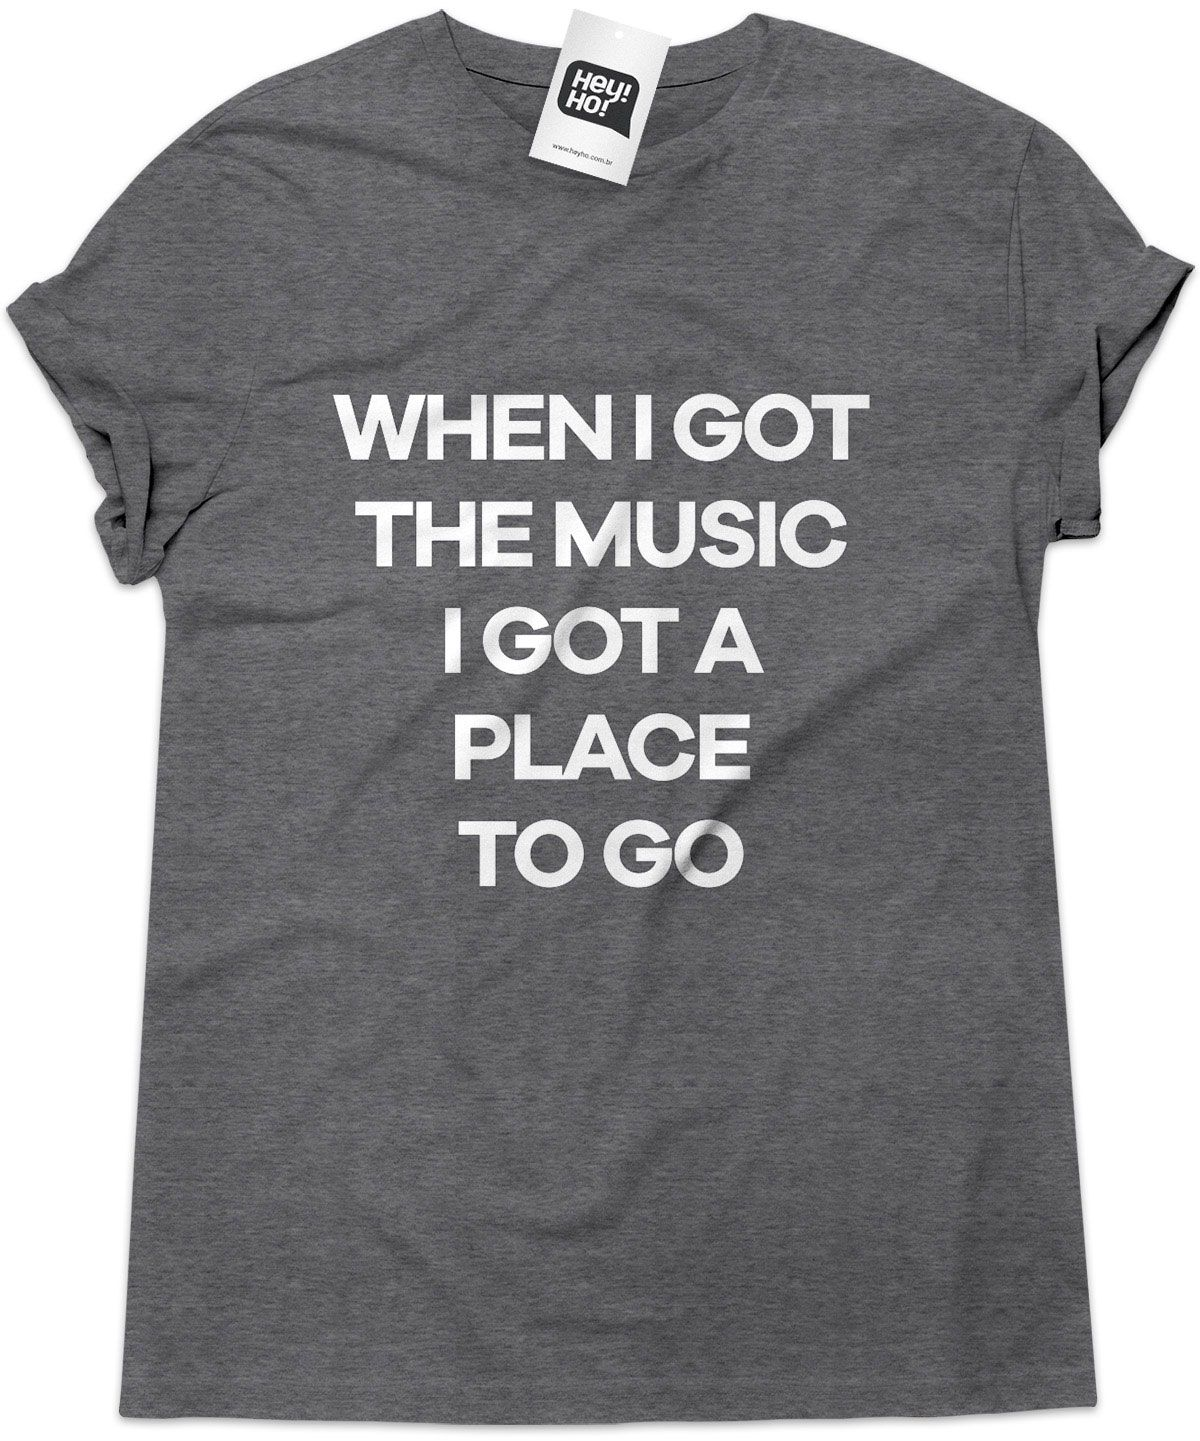 RANCID - When I got the music